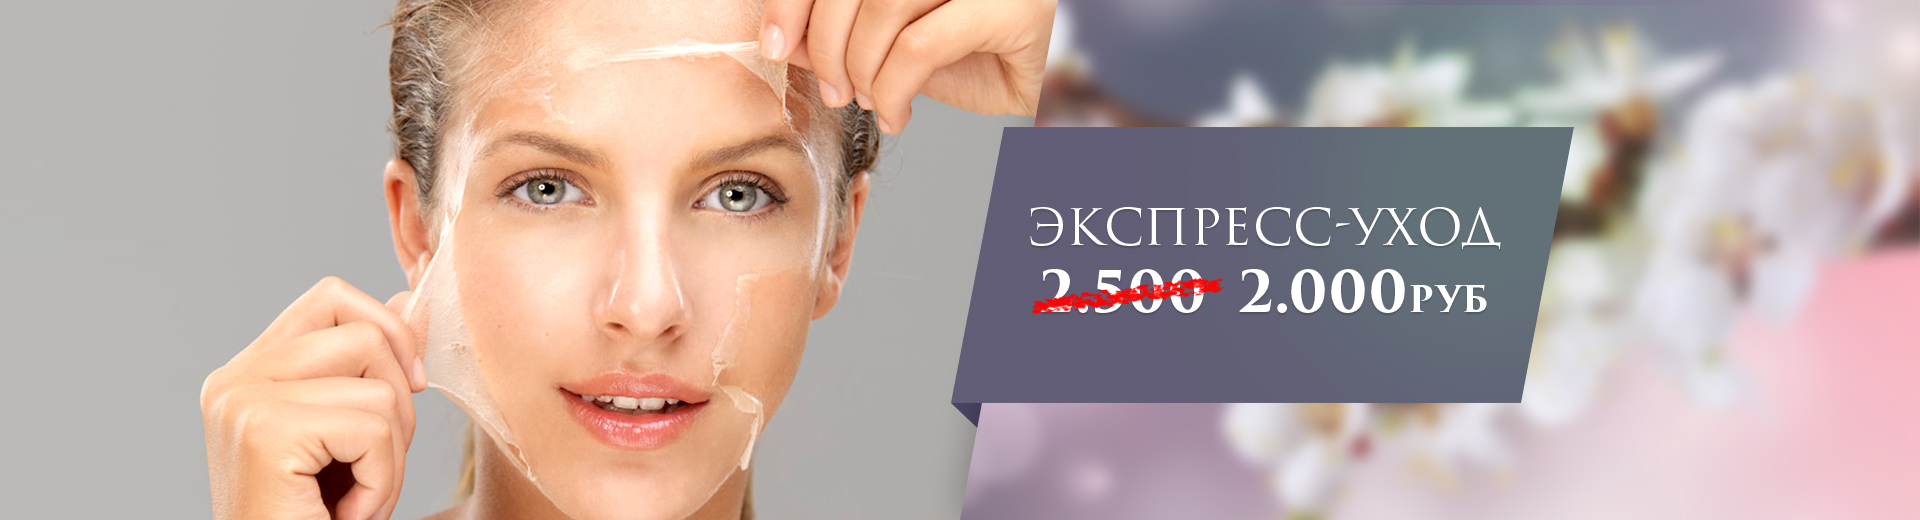 Экспресс-уход за 2000 рублей